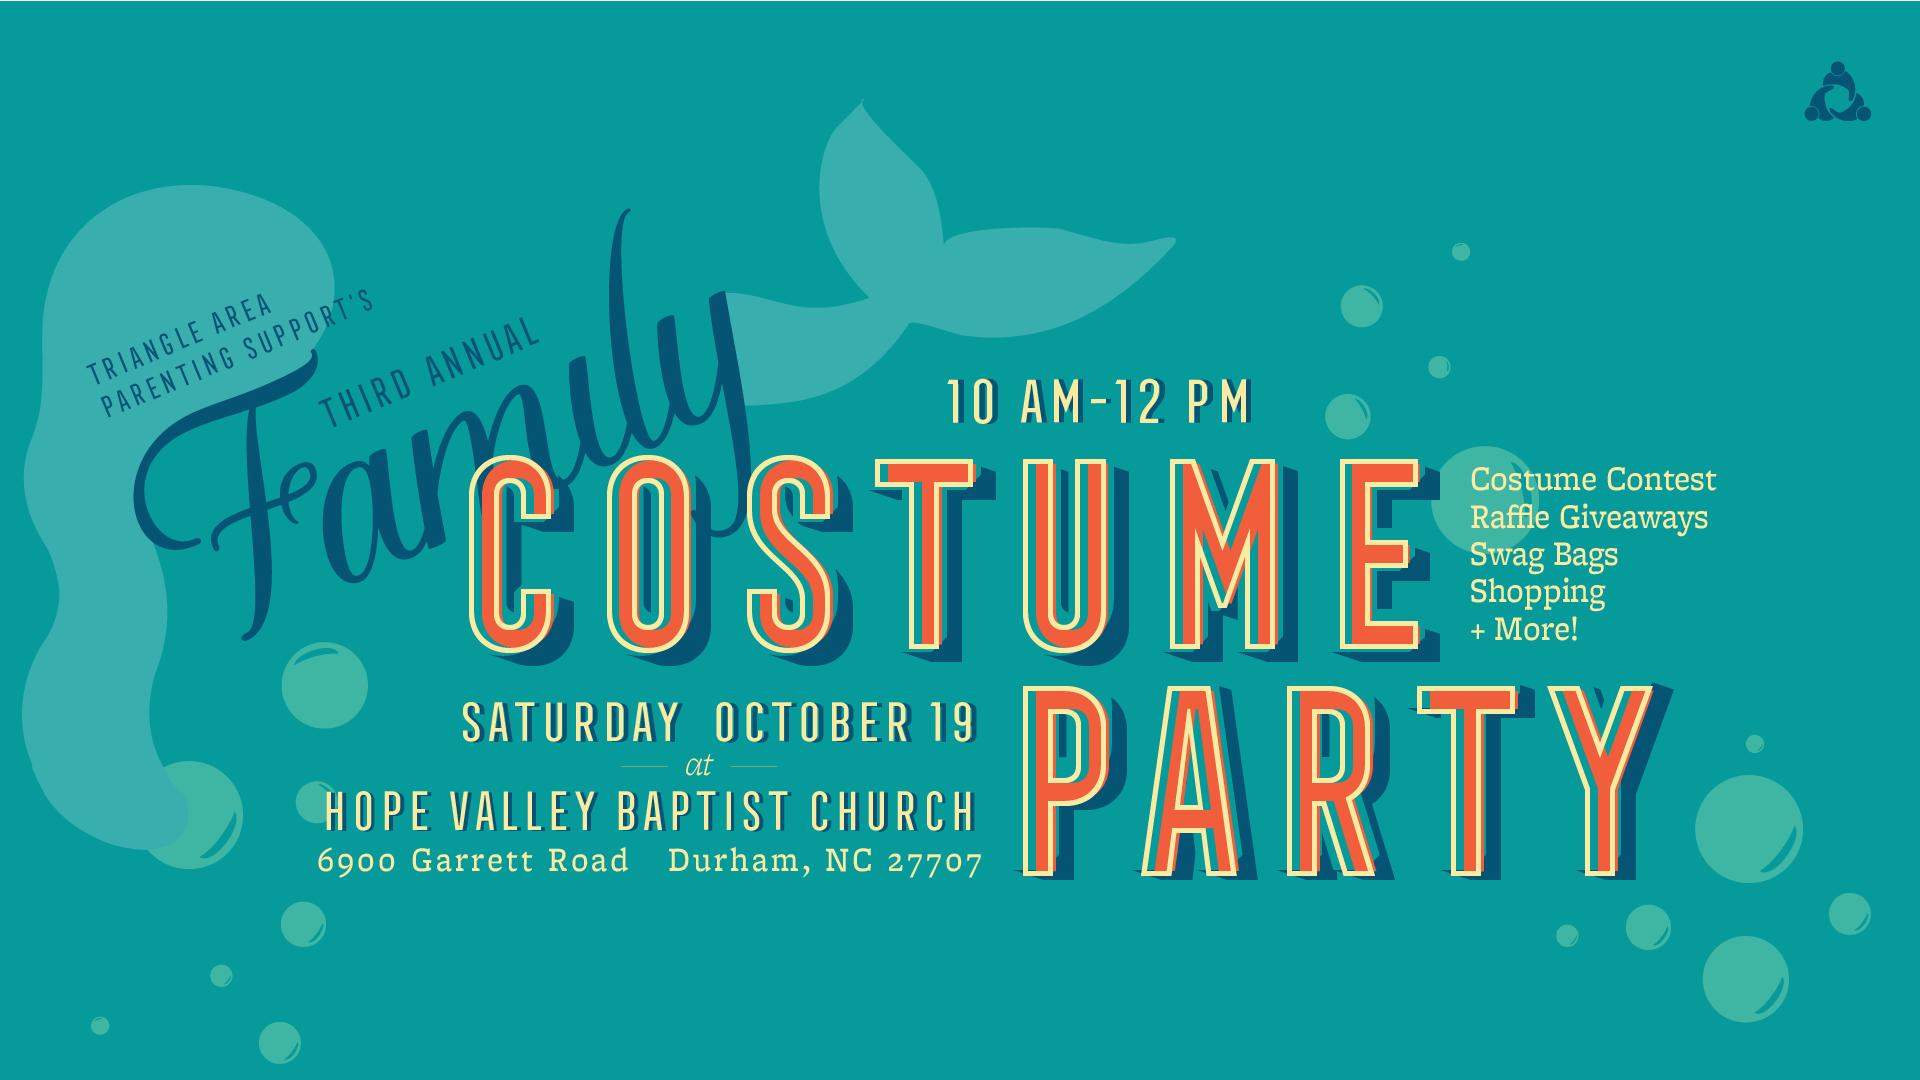 Costumes, Raffles, Photos, Vendors, Teal Pumpkin and Trick-or-Treats, Games, and Fun!